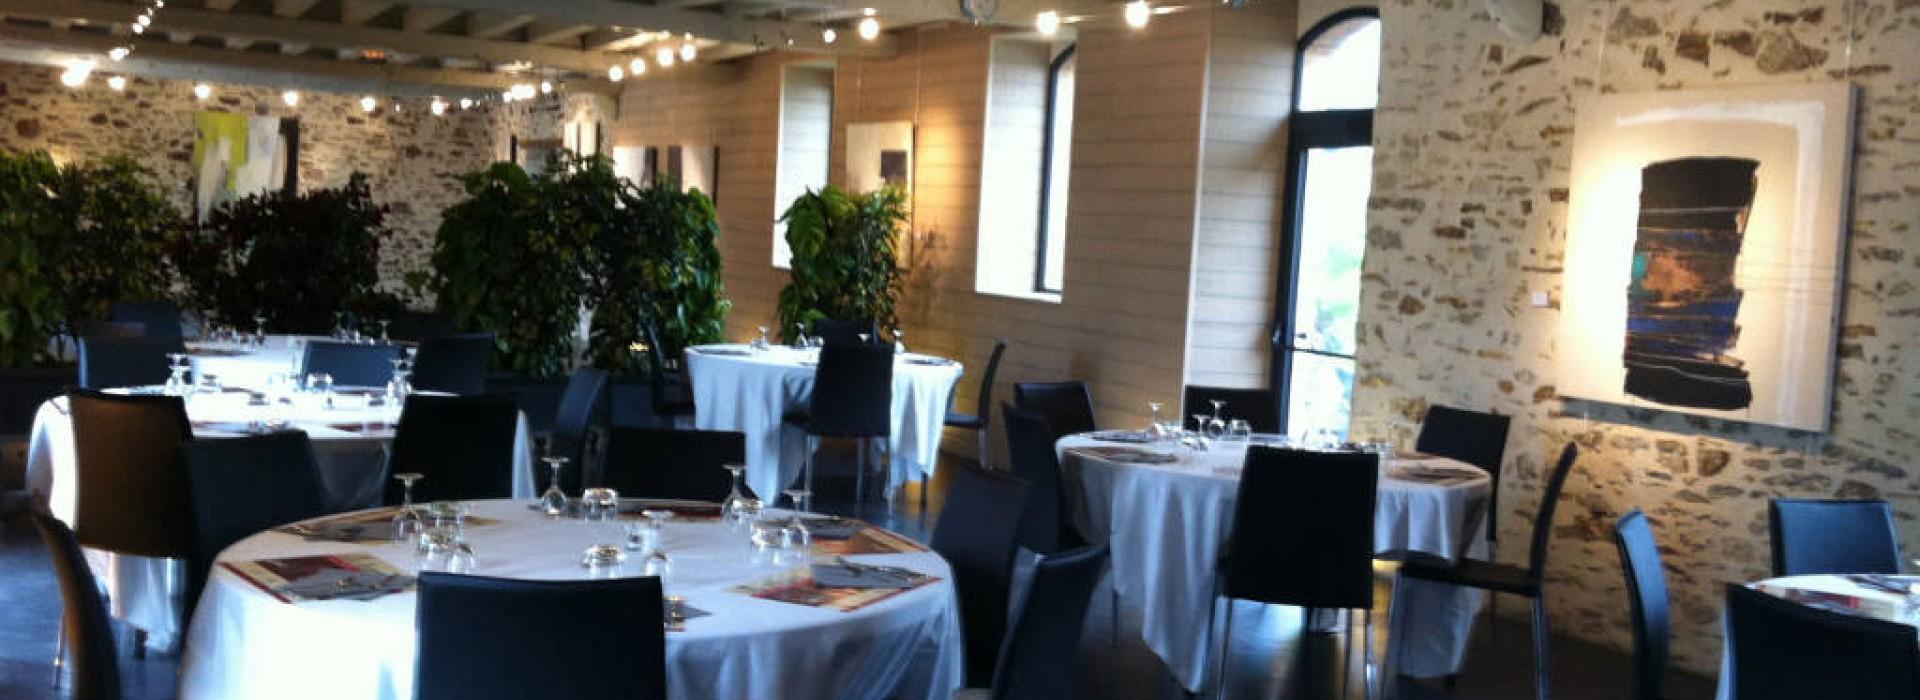 Restaurant la salle a manger restaurants en pays de la loire for Restaurant la salle a manger 75015